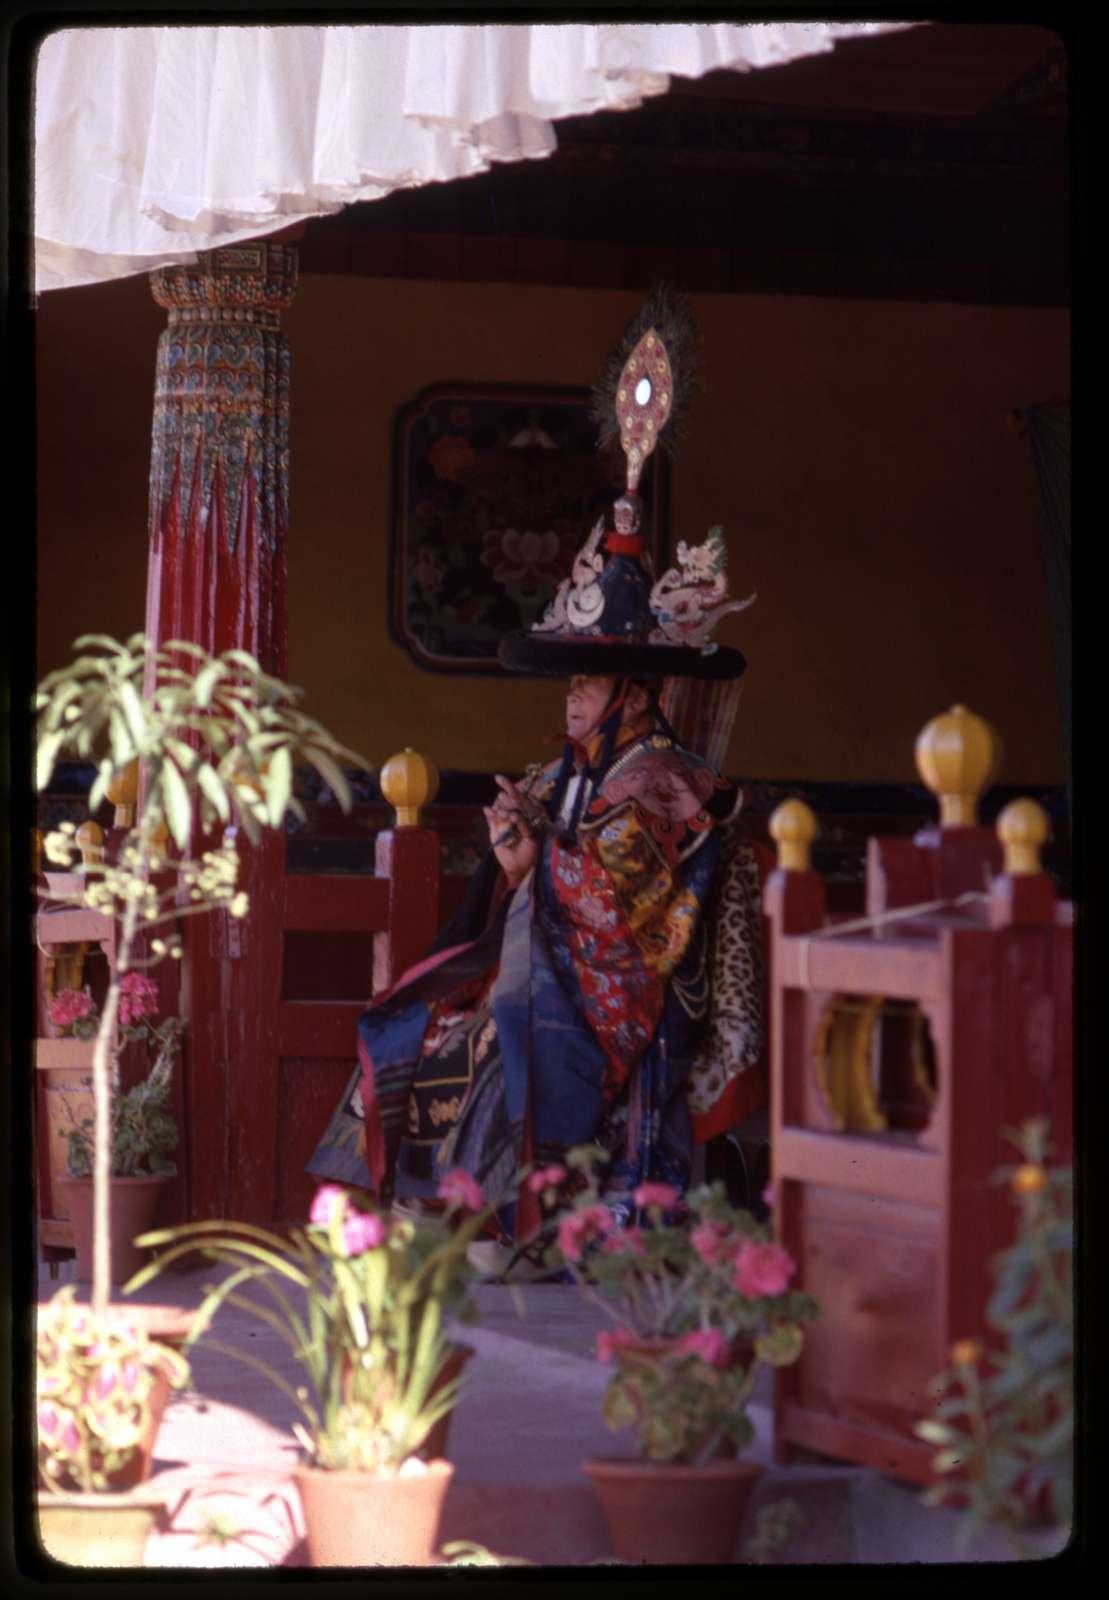 [Head Black Hat Lama chanting during New Year's ceremony, Gangtok, Sikkim]